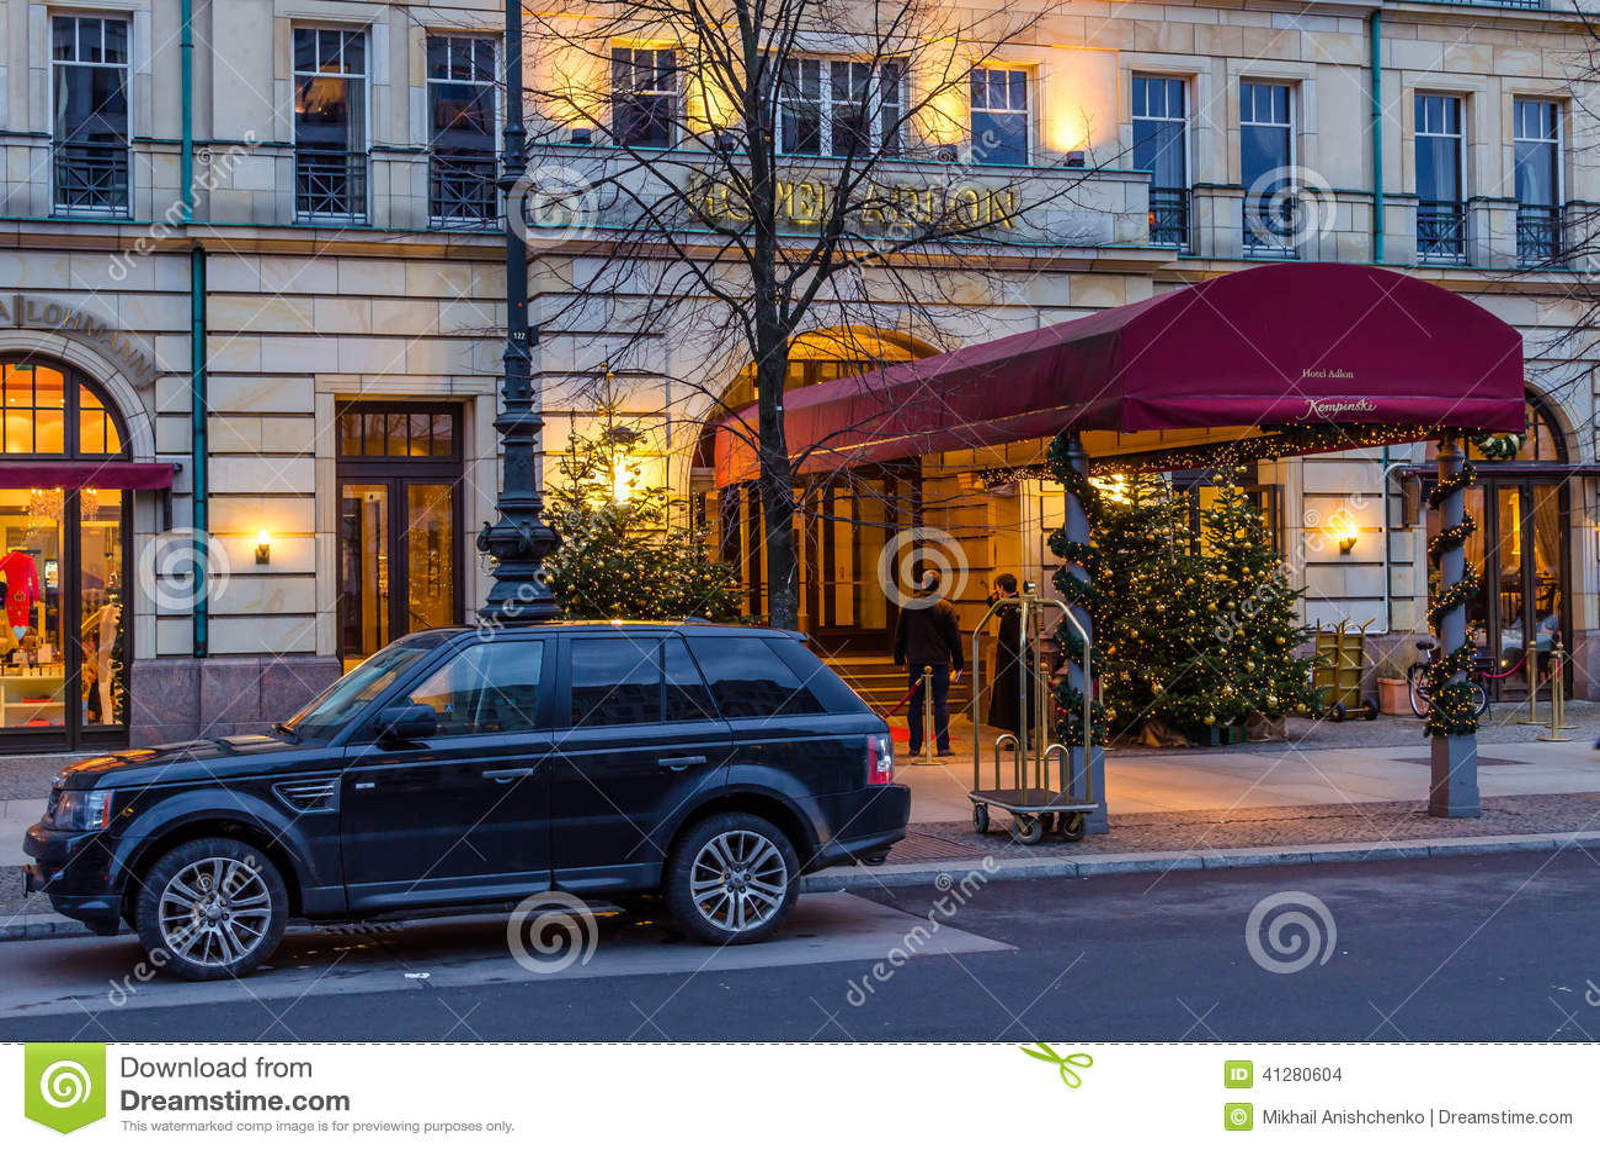 h tel de luxe adlon berlin image stock ditorial image 41280604. Black Bedroom Furniture Sets. Home Design Ideas